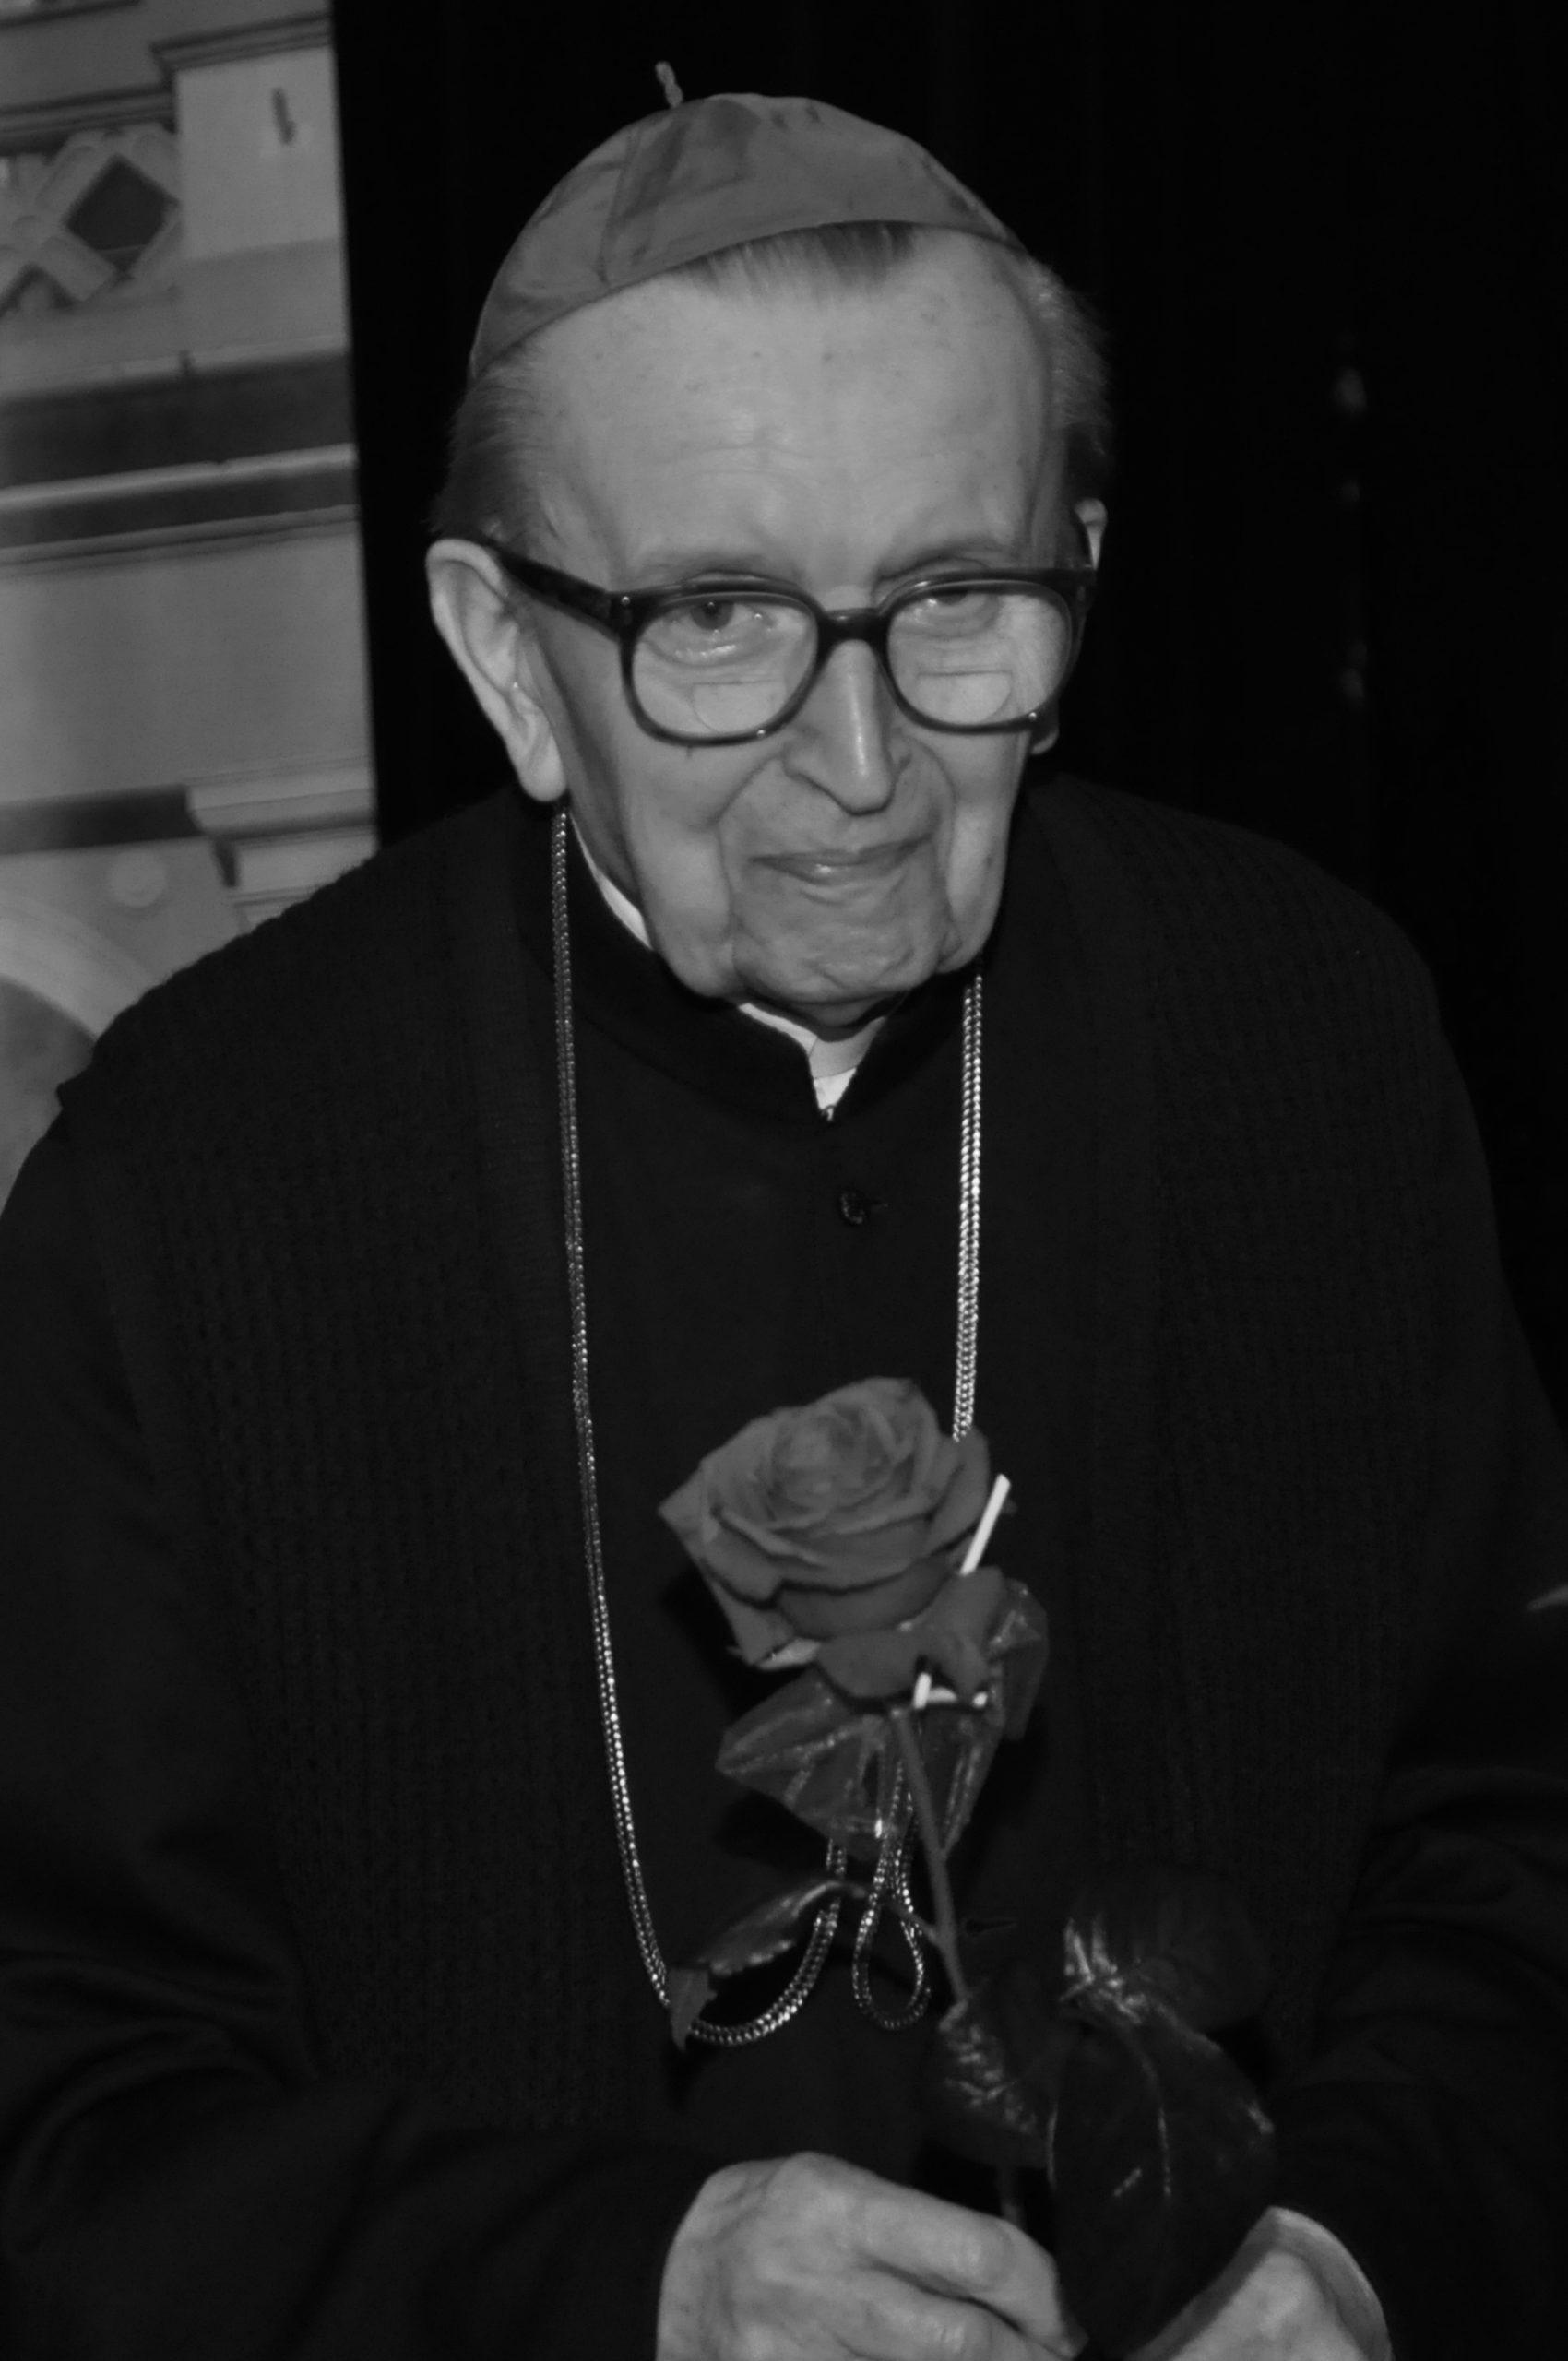 Zmarł Ksiądz Biskup dr Edward Materski